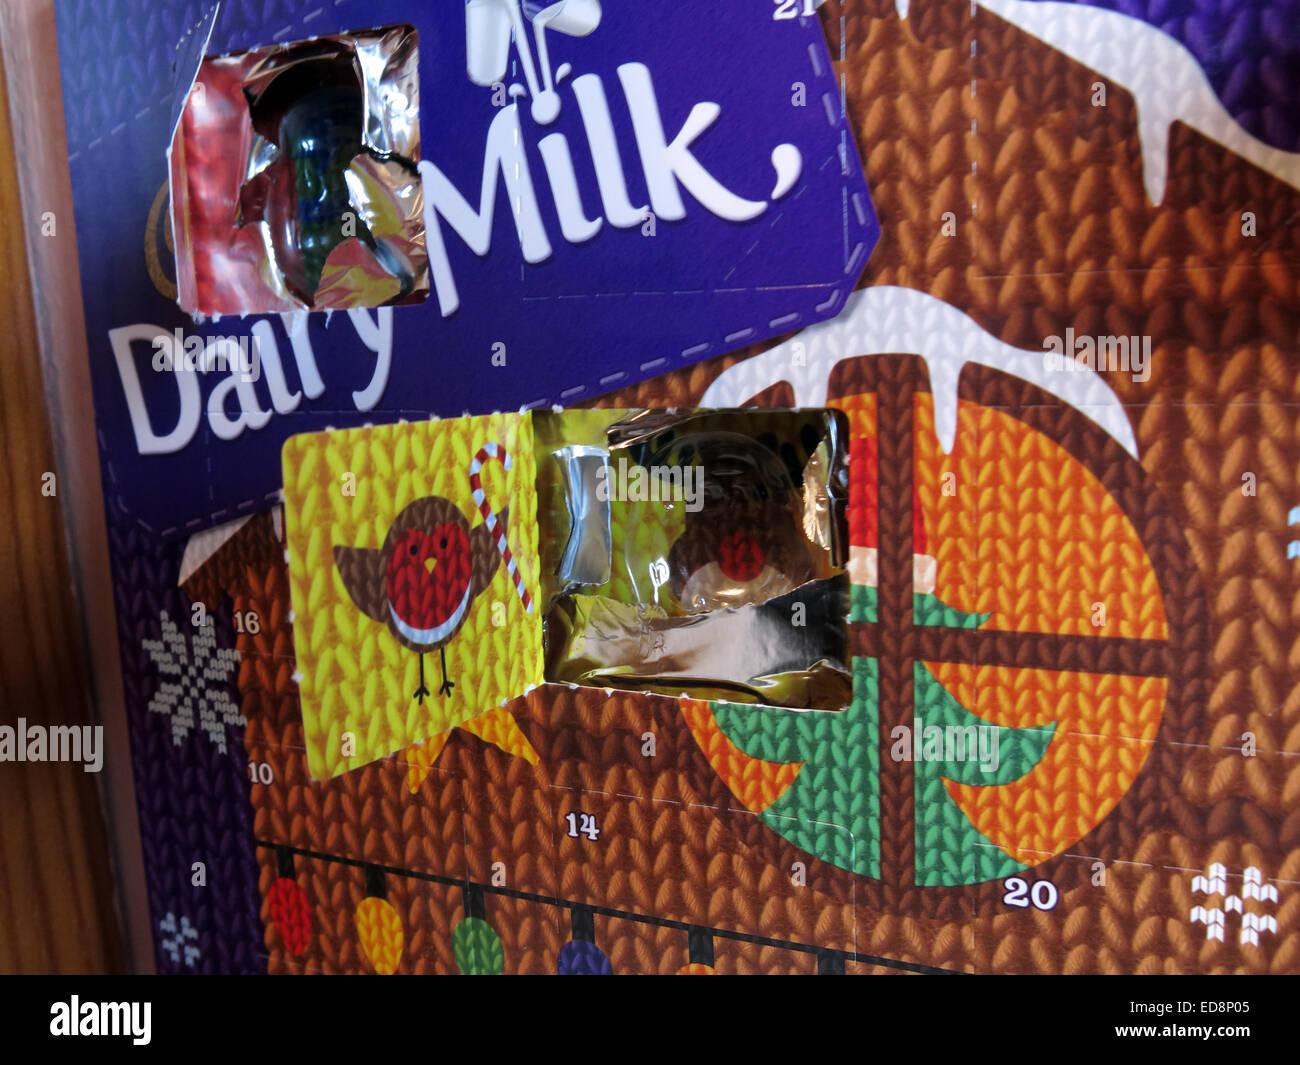 English Cadbury,christian,Catholic,anglican,traditional,with,one,window,open,cadburys,festive,food,yuletide,special,celebrate,Jesus,Christ,birth,born,festival,Julekalender,Julkalender,Jóladagatal,child,children,nostalgic,Gotonysmith